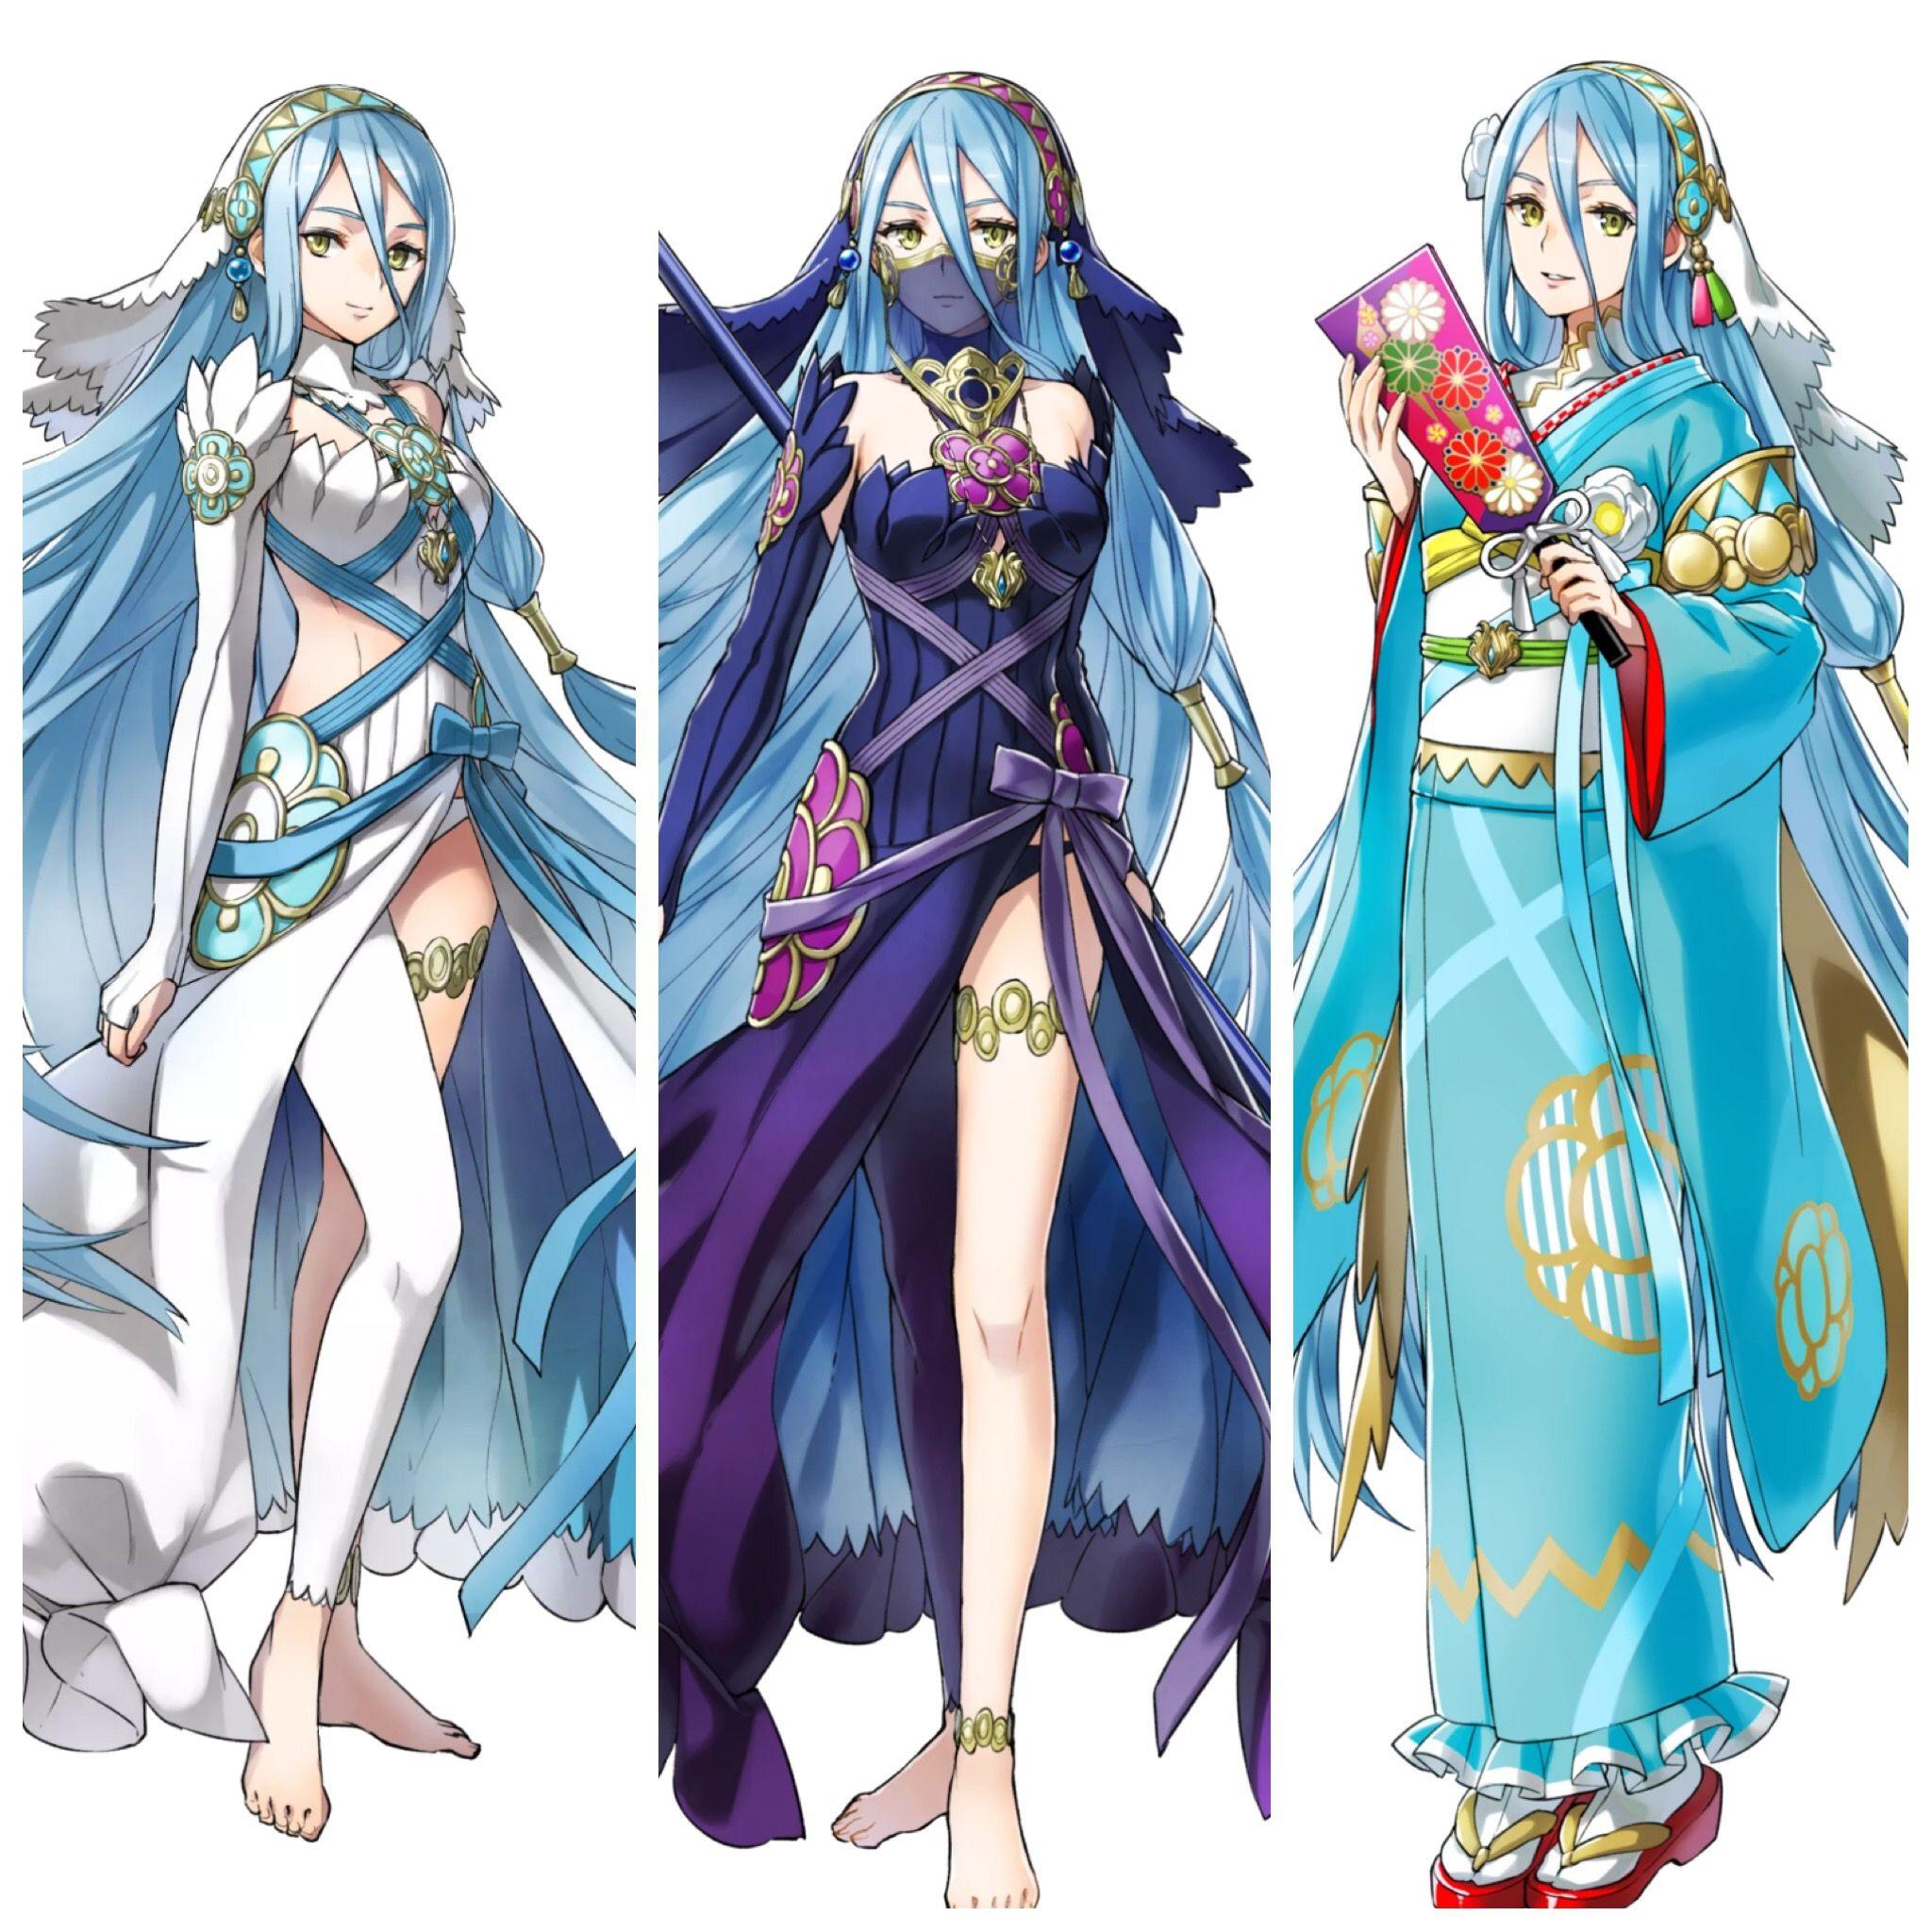 Fire Emblem Heroes - Stunning Cosplay of Azura